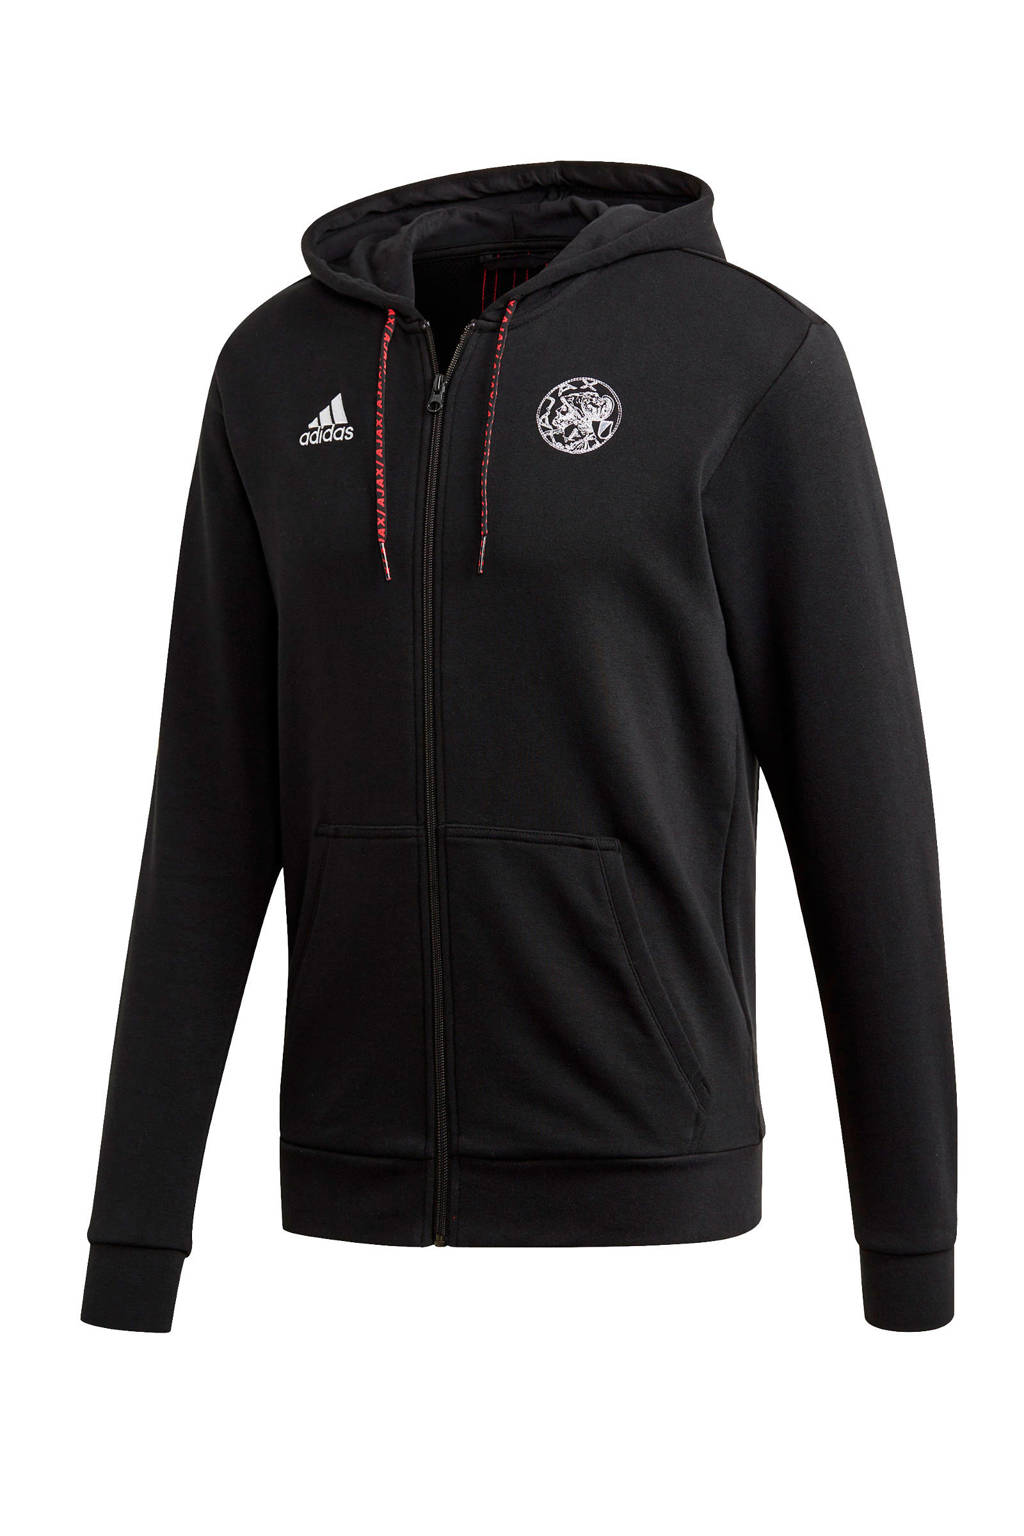 adidas Performance Senior Ajax vest zwart, Zwart